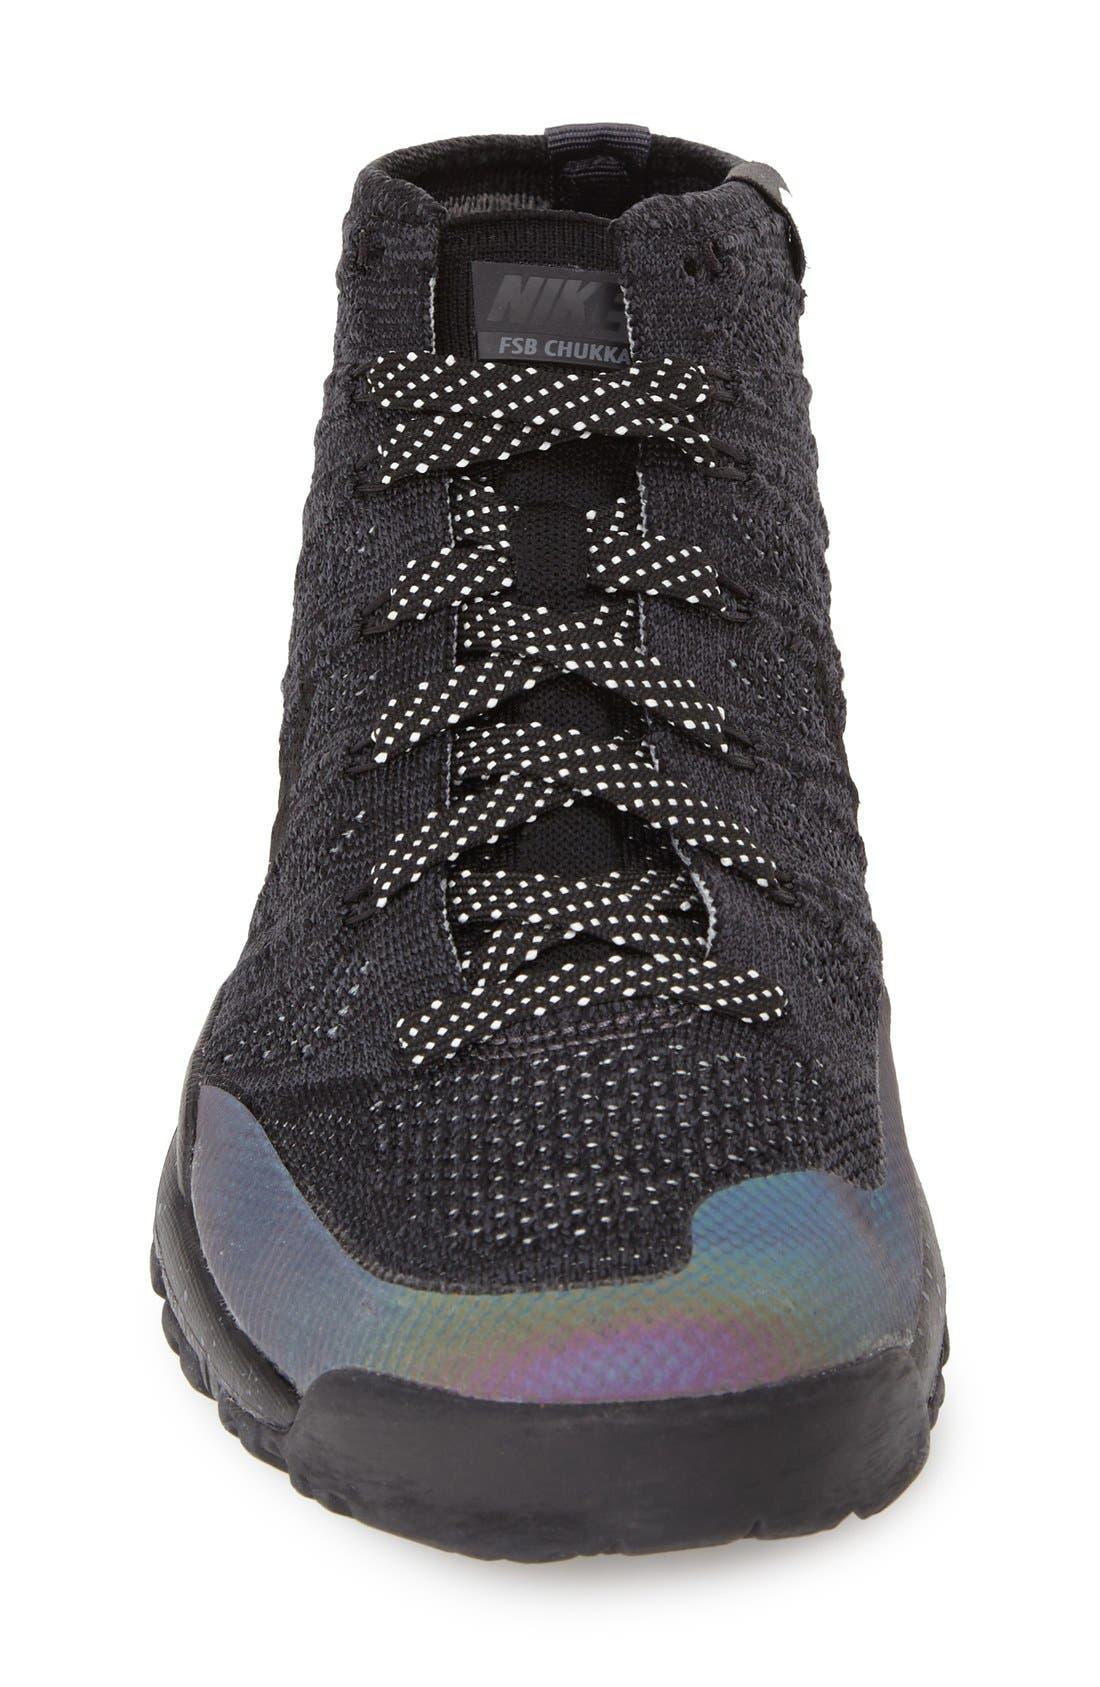 a020f55804dc ... sale nike flyknit trainer chukka fsb sneaker men nordstrom 9657a b62c1